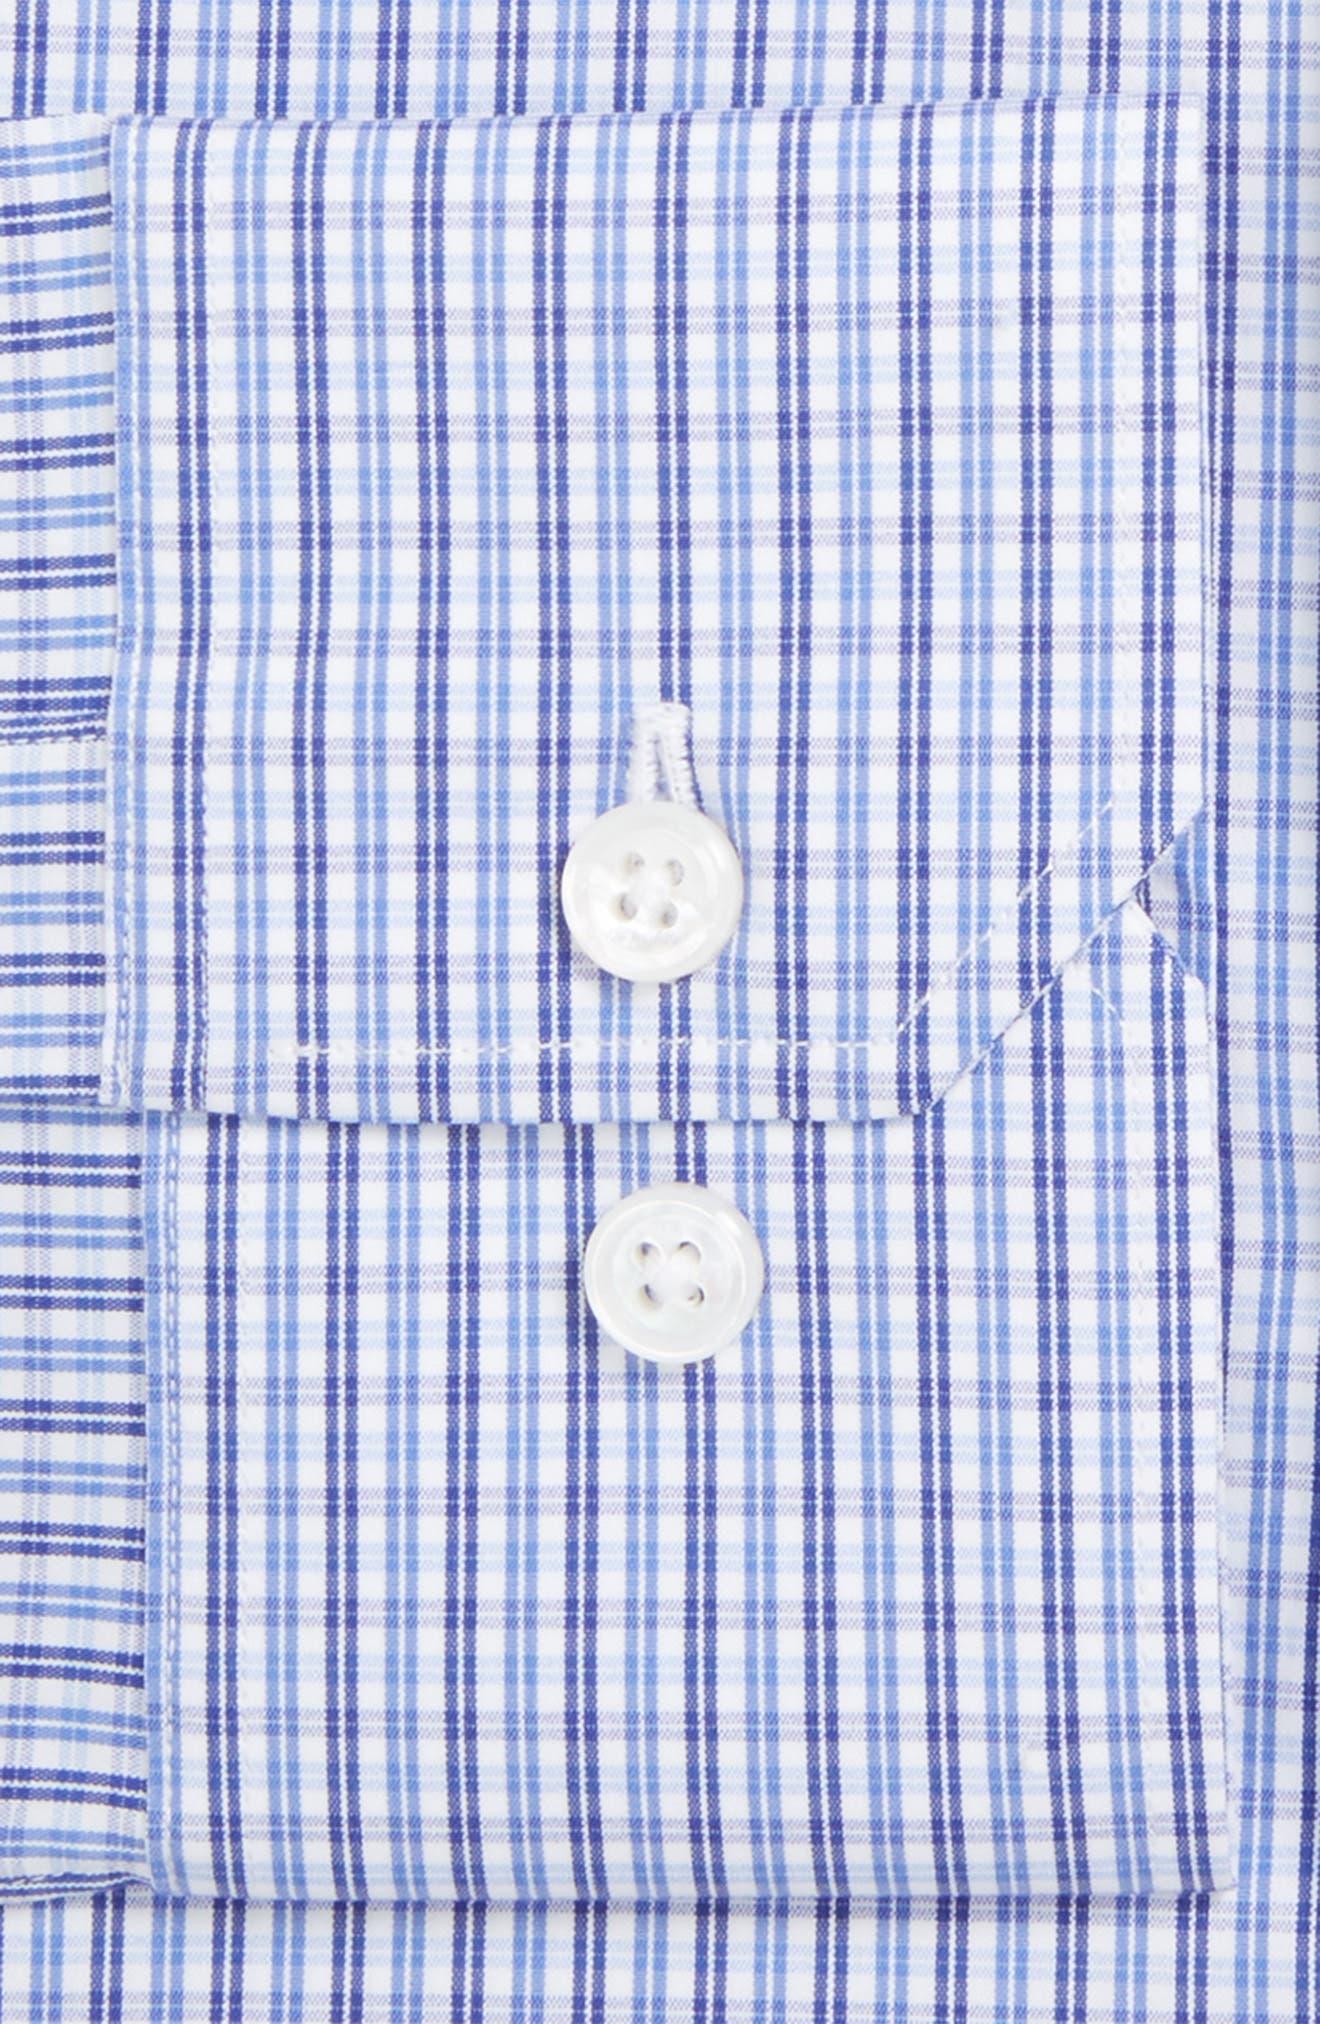 Jetsetter Slim Fit Check Stretch Dress Shirt,                         Main,                         color, 400